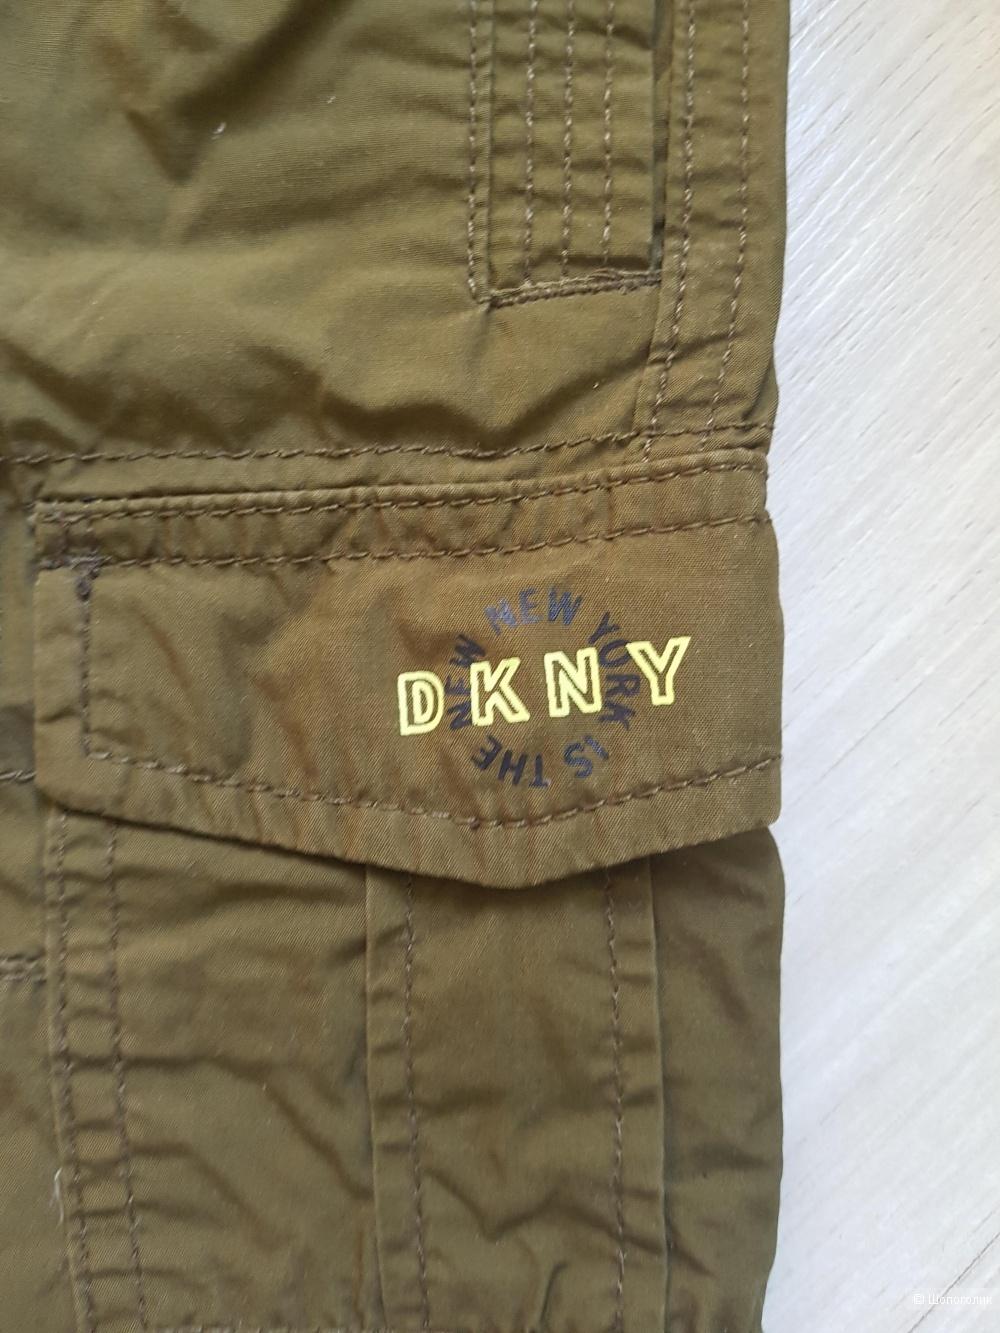 Шорты DKNY, на 3 года